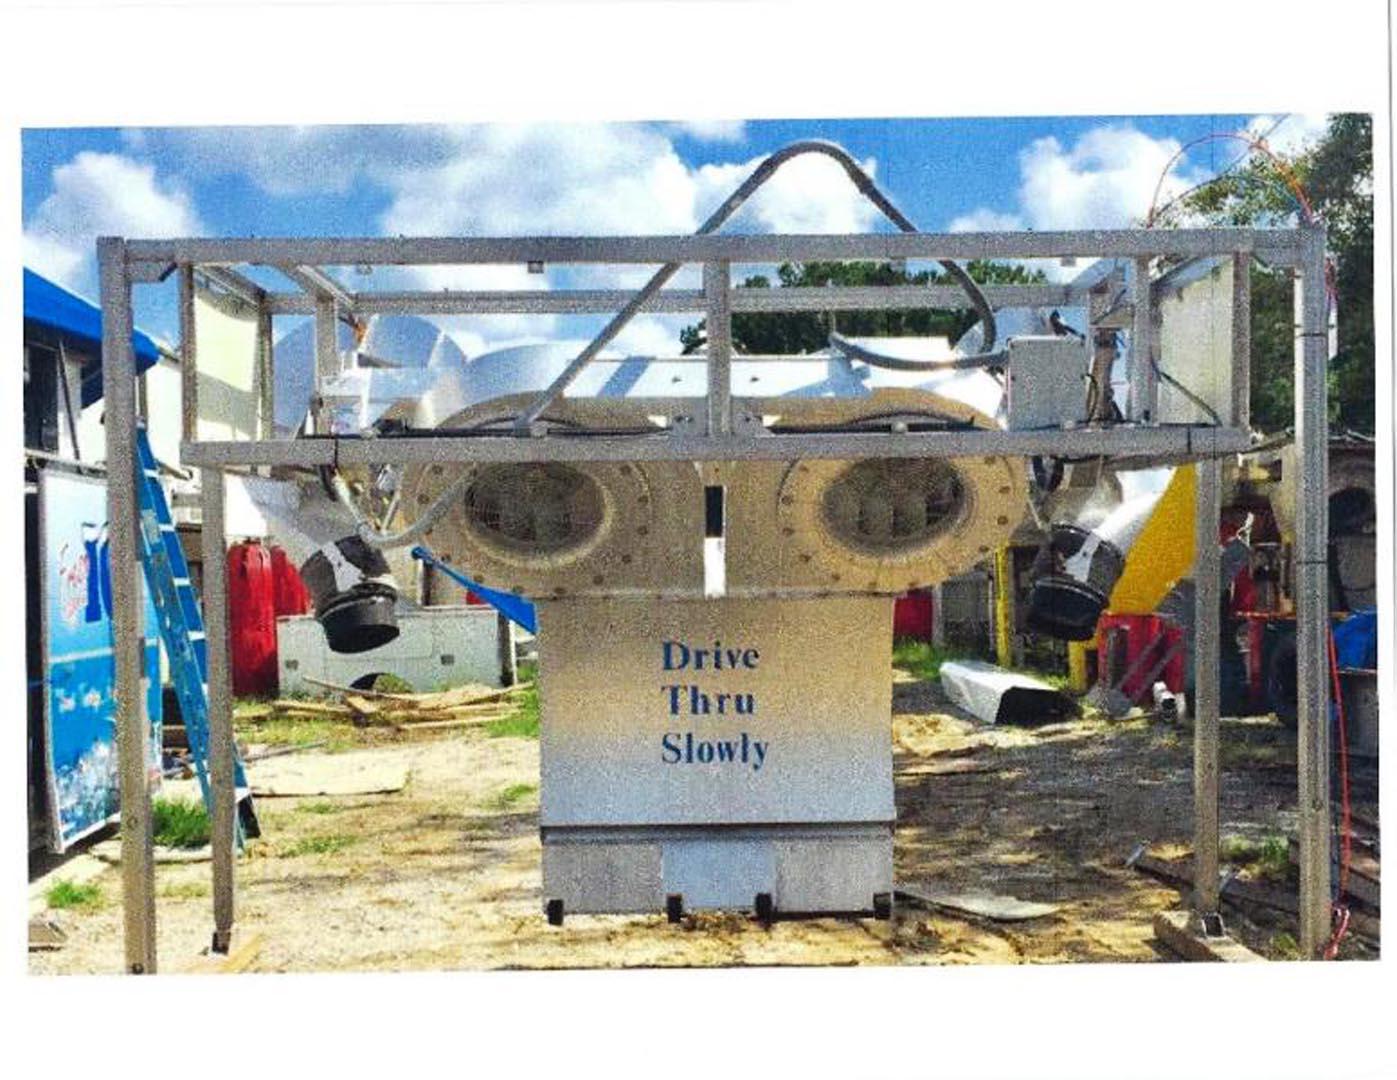 Tpsr Ryko Ohd Thrust Pro Ryko Carwash Dryers Rkyo